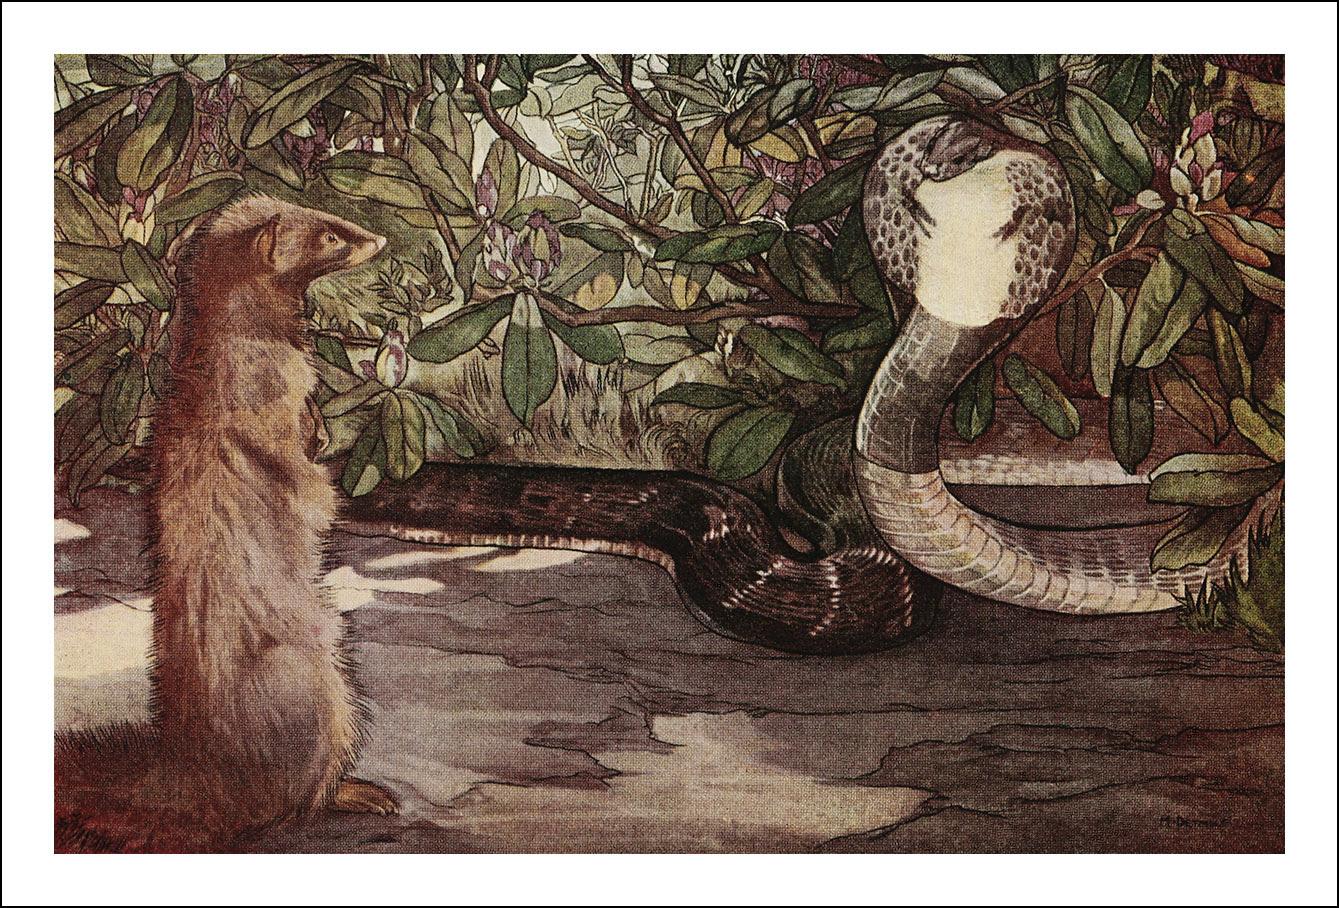 Edward Julius & Maurice Detmold, The jungle book